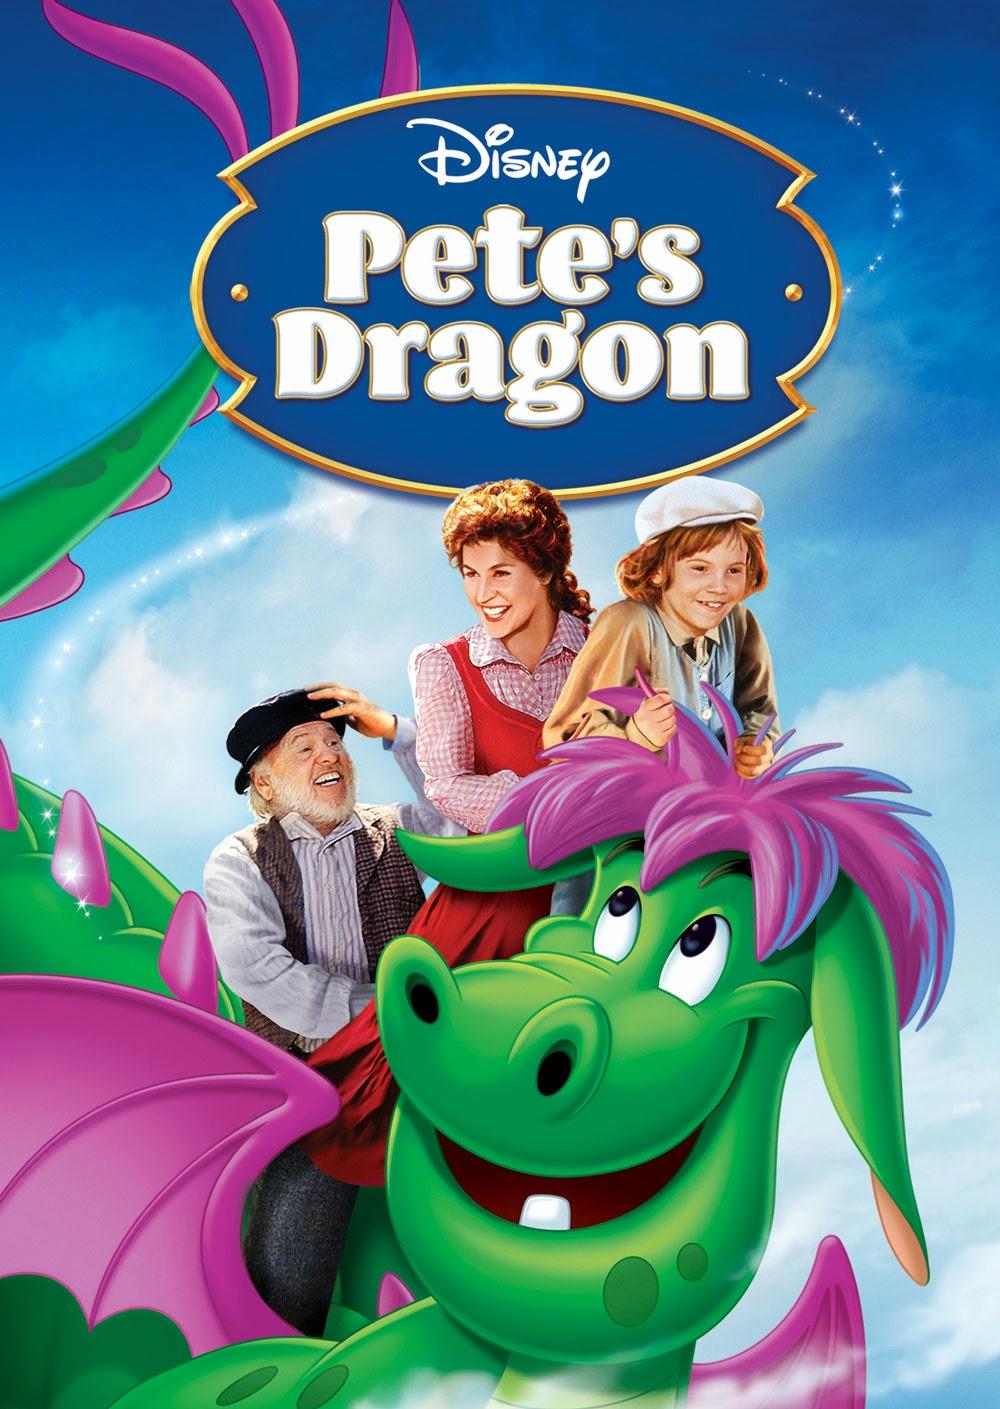 Pete's-Dragon-Disney-Movie